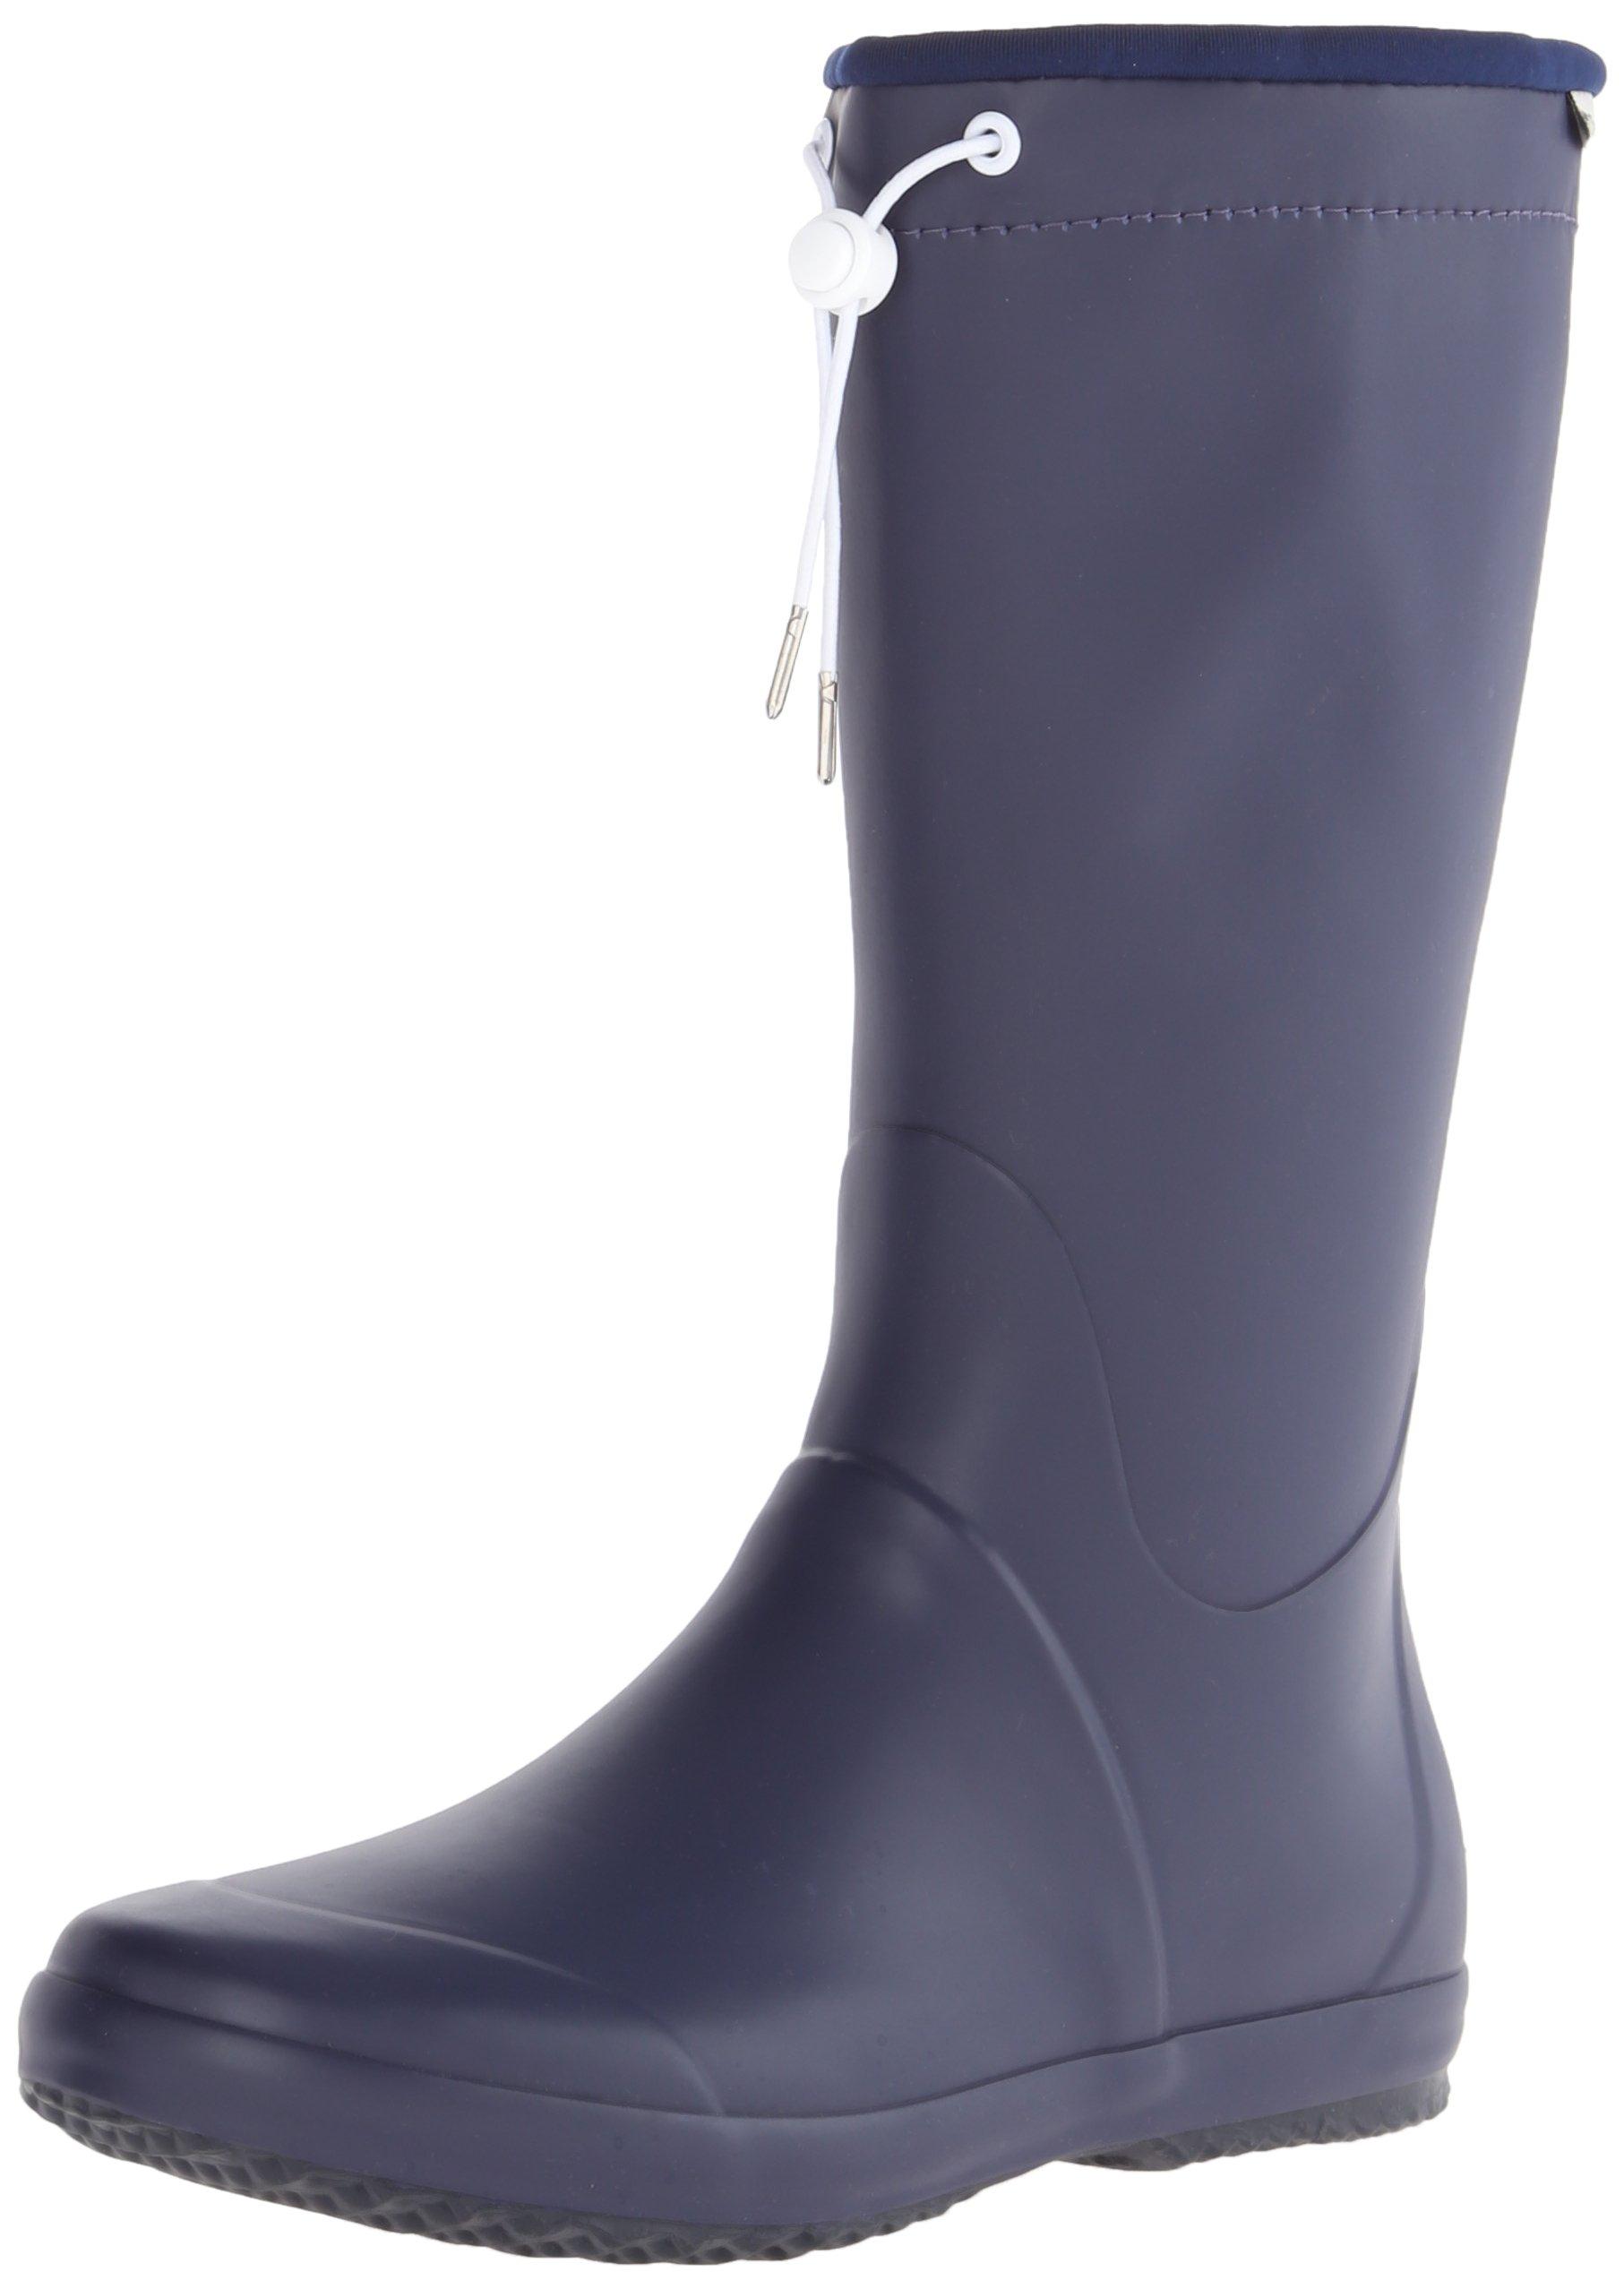 Tretorn Women's Viken Rain Boot, Navy, 40 EU/9 B US